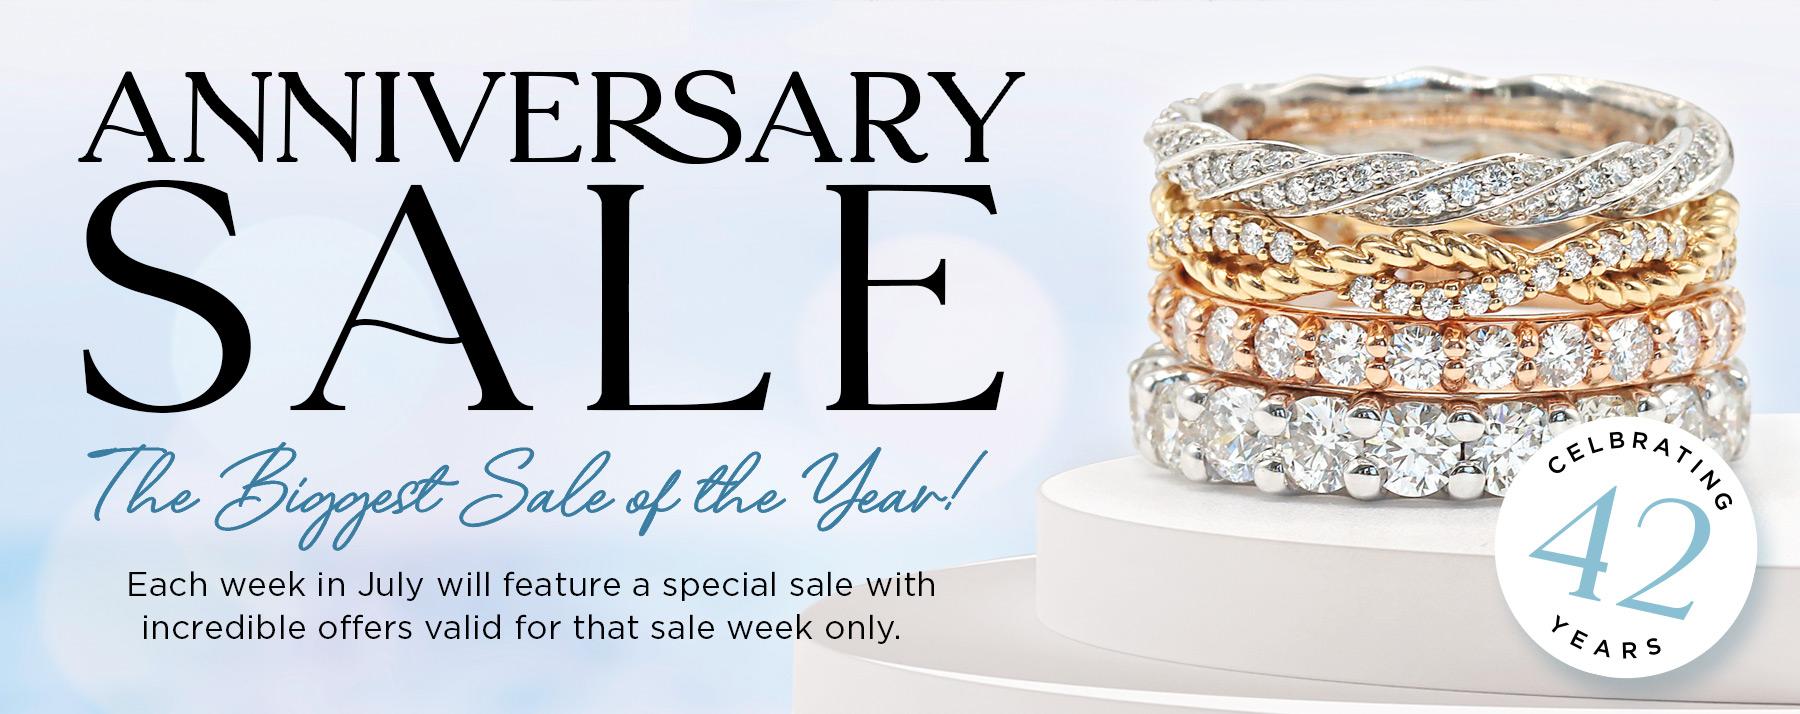 42nd Anniversary Sale